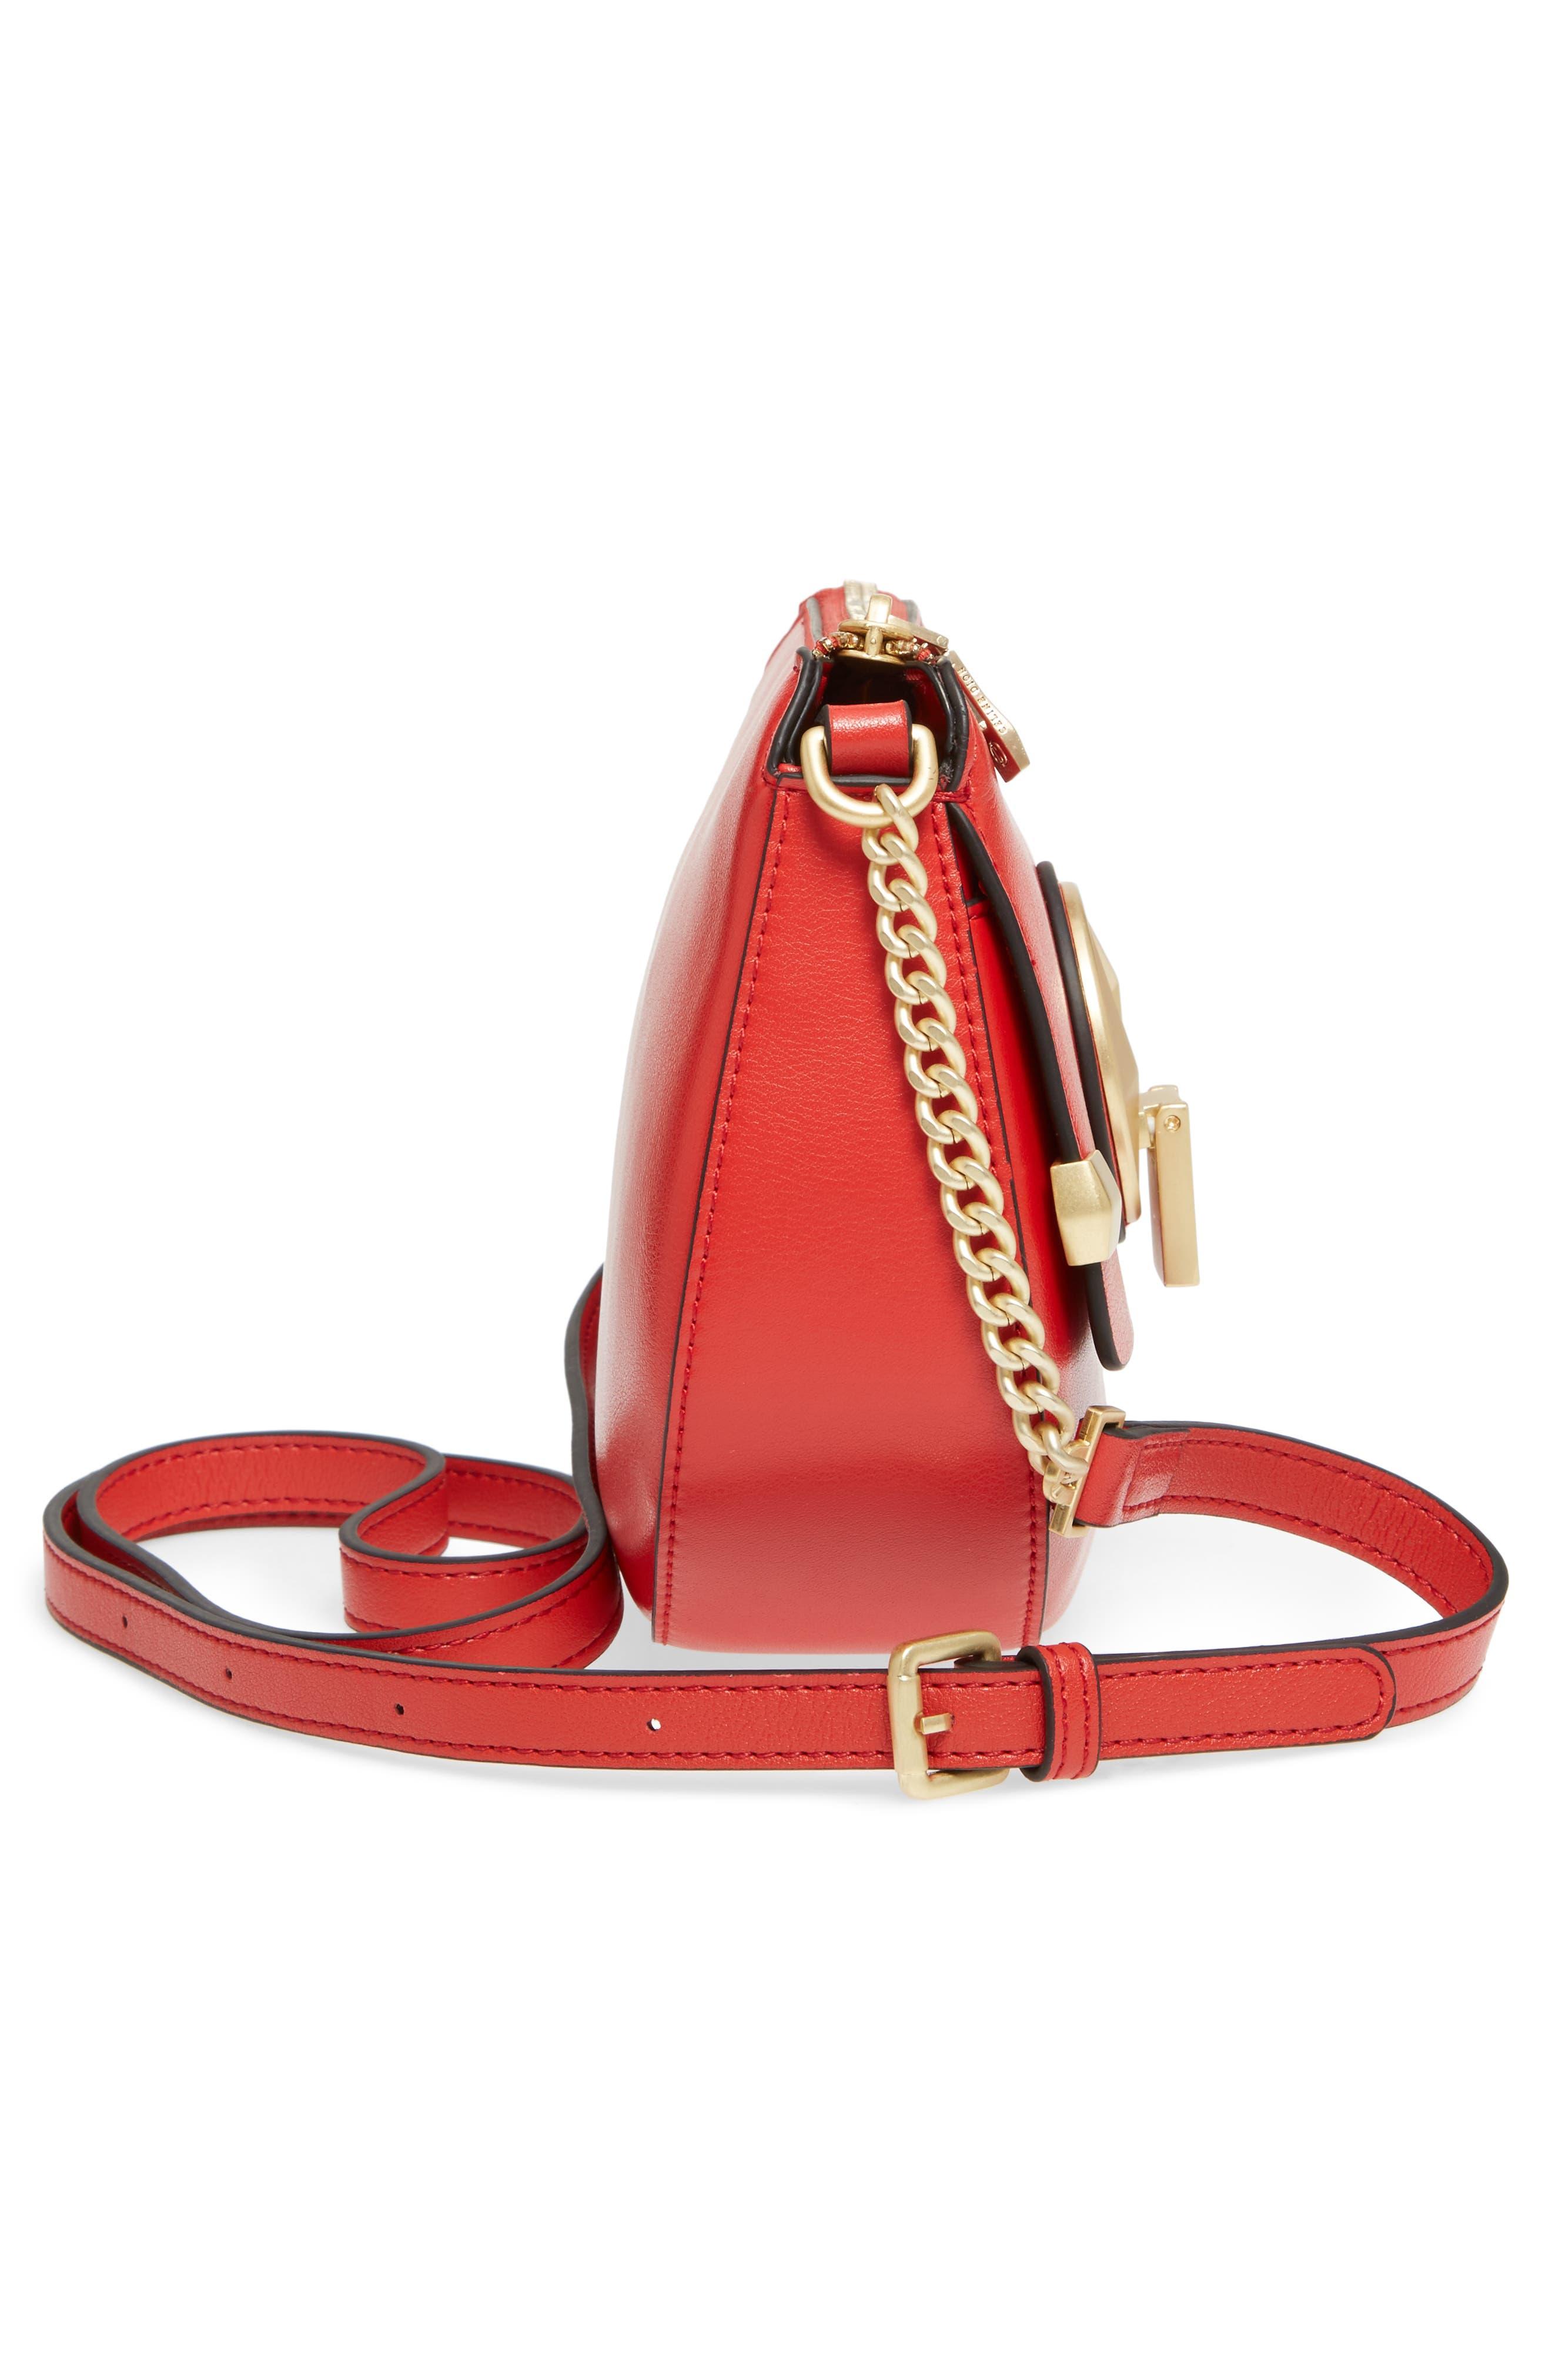 Céline Dion Octave Leather Crossbody Bag,                             Alternate thumbnail 5, color,                             Red